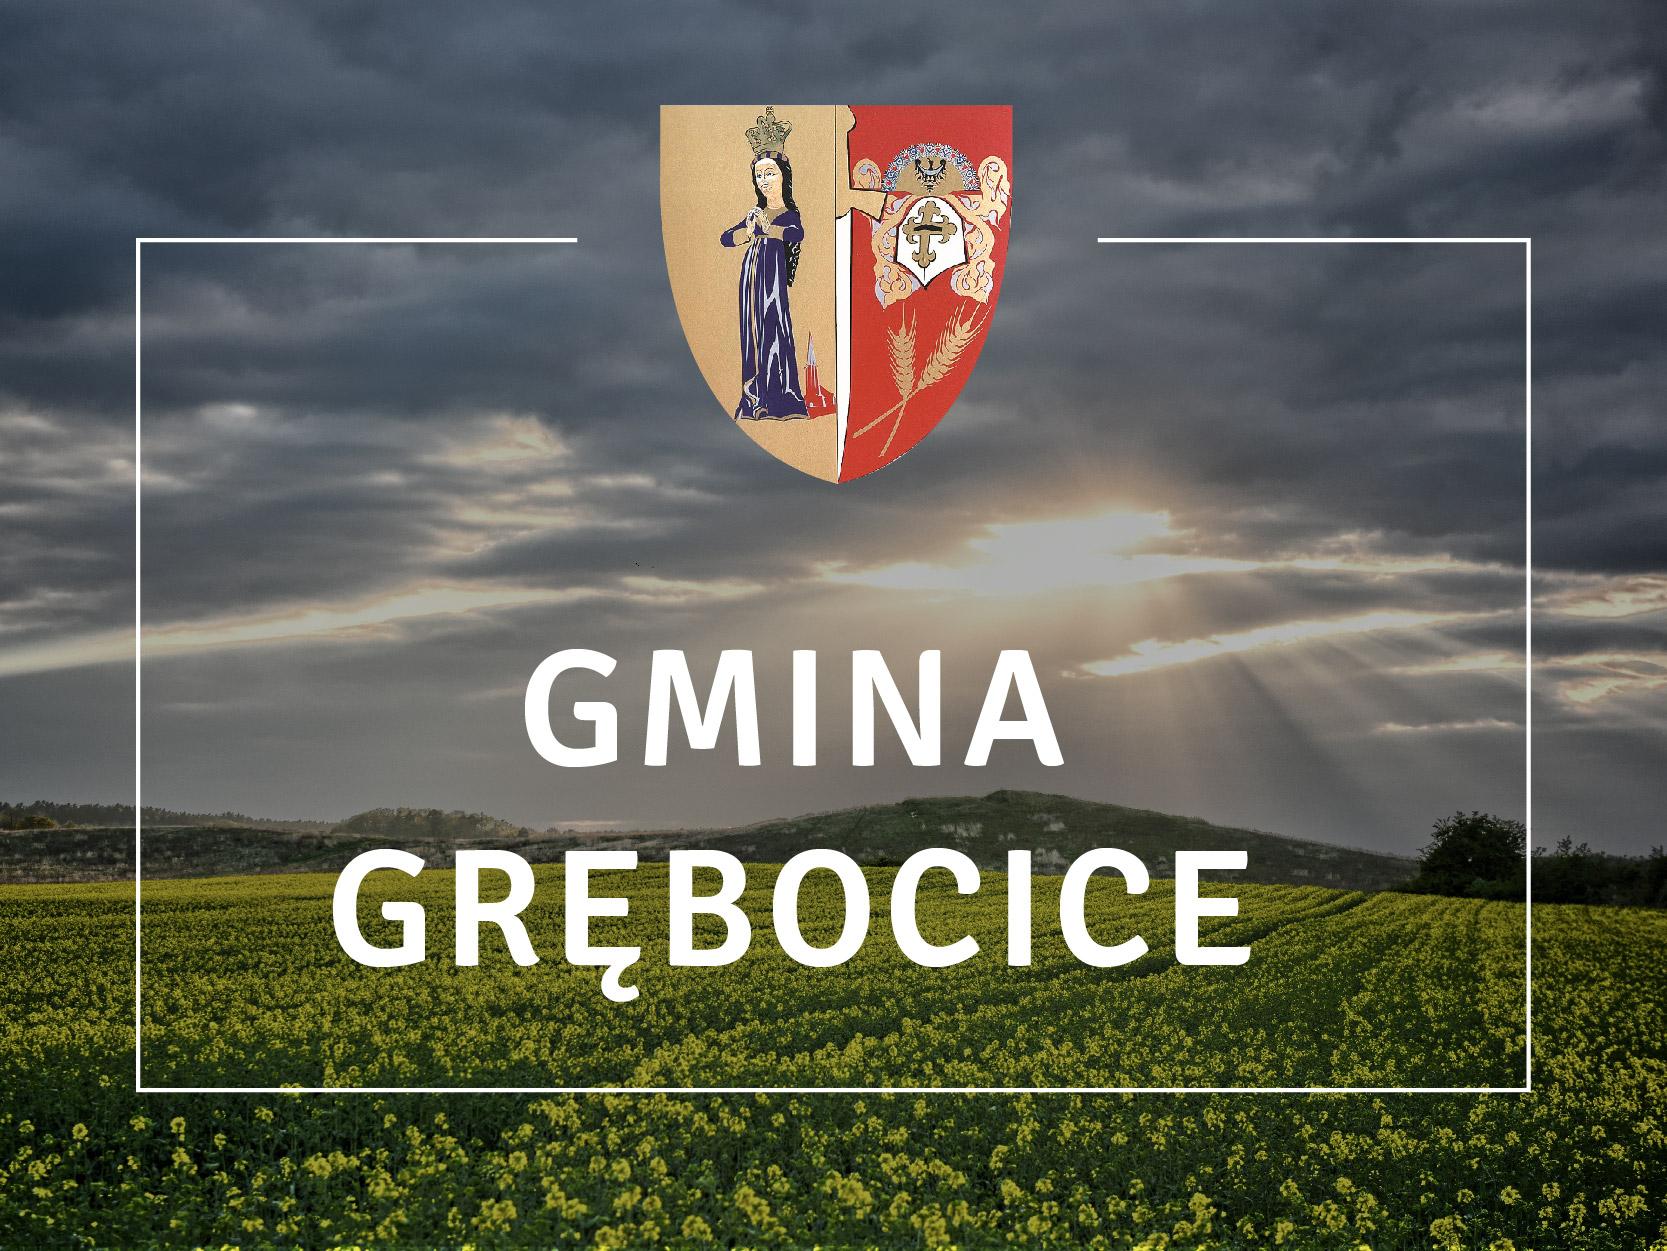 Gmina Grębocice